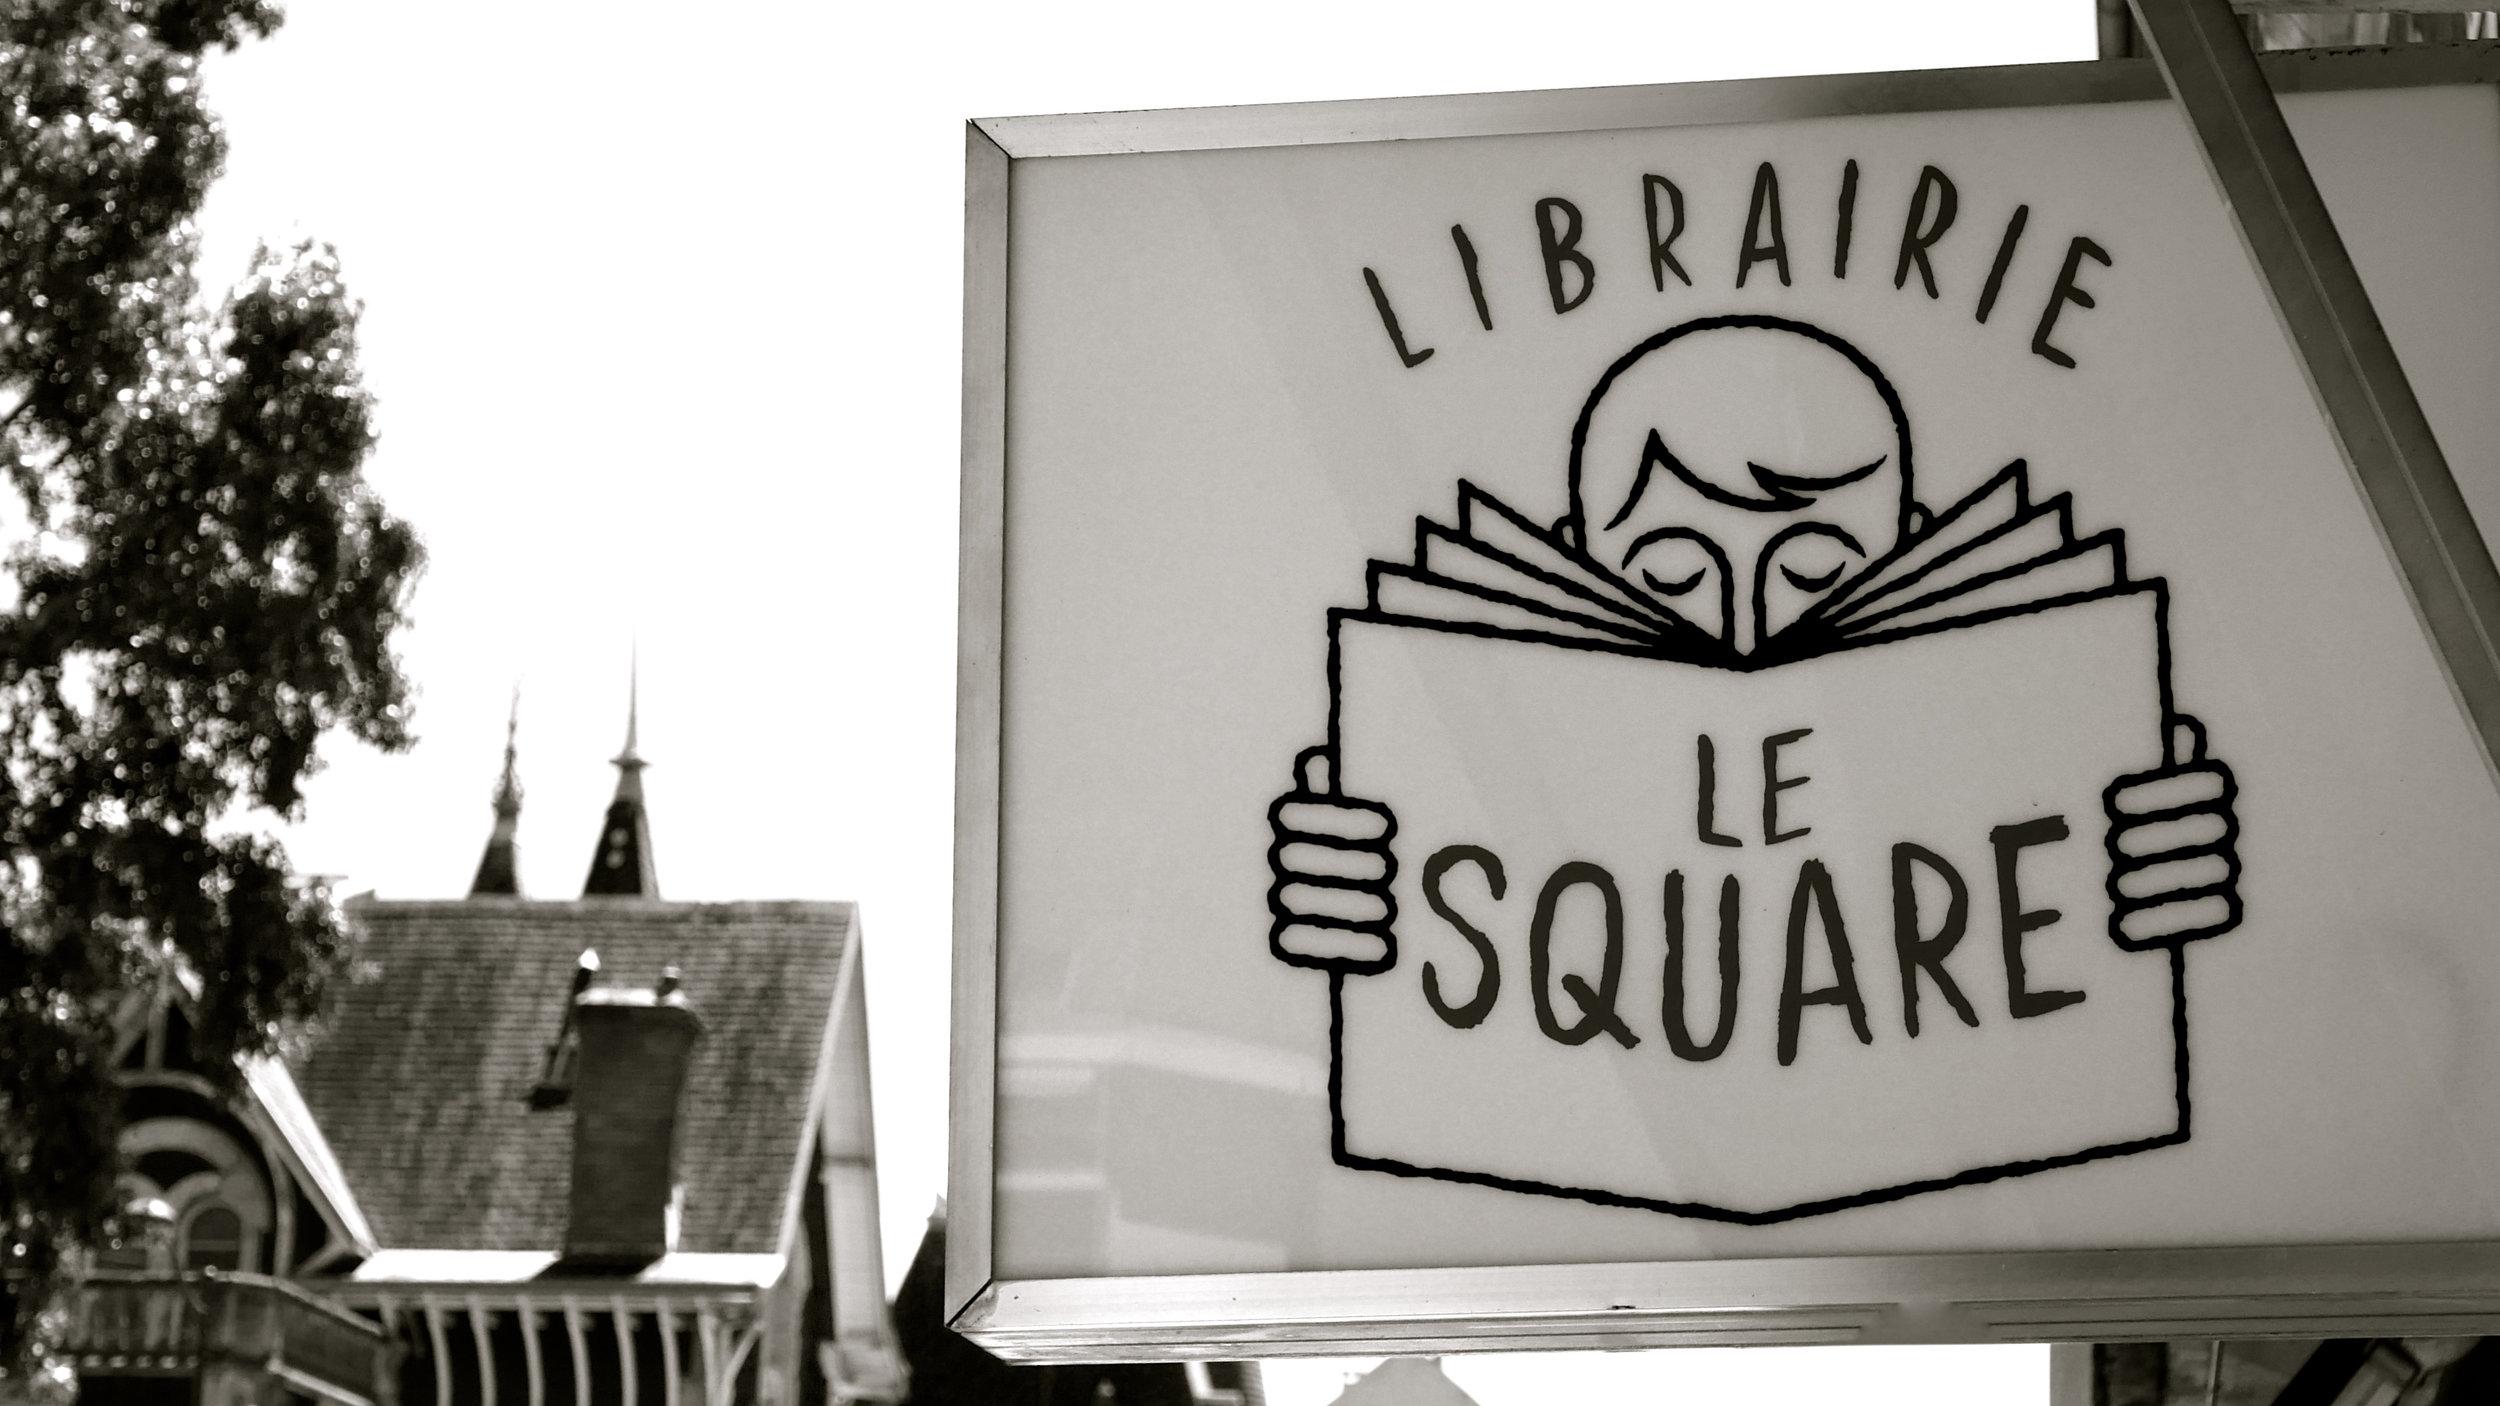 Librairie Le Square